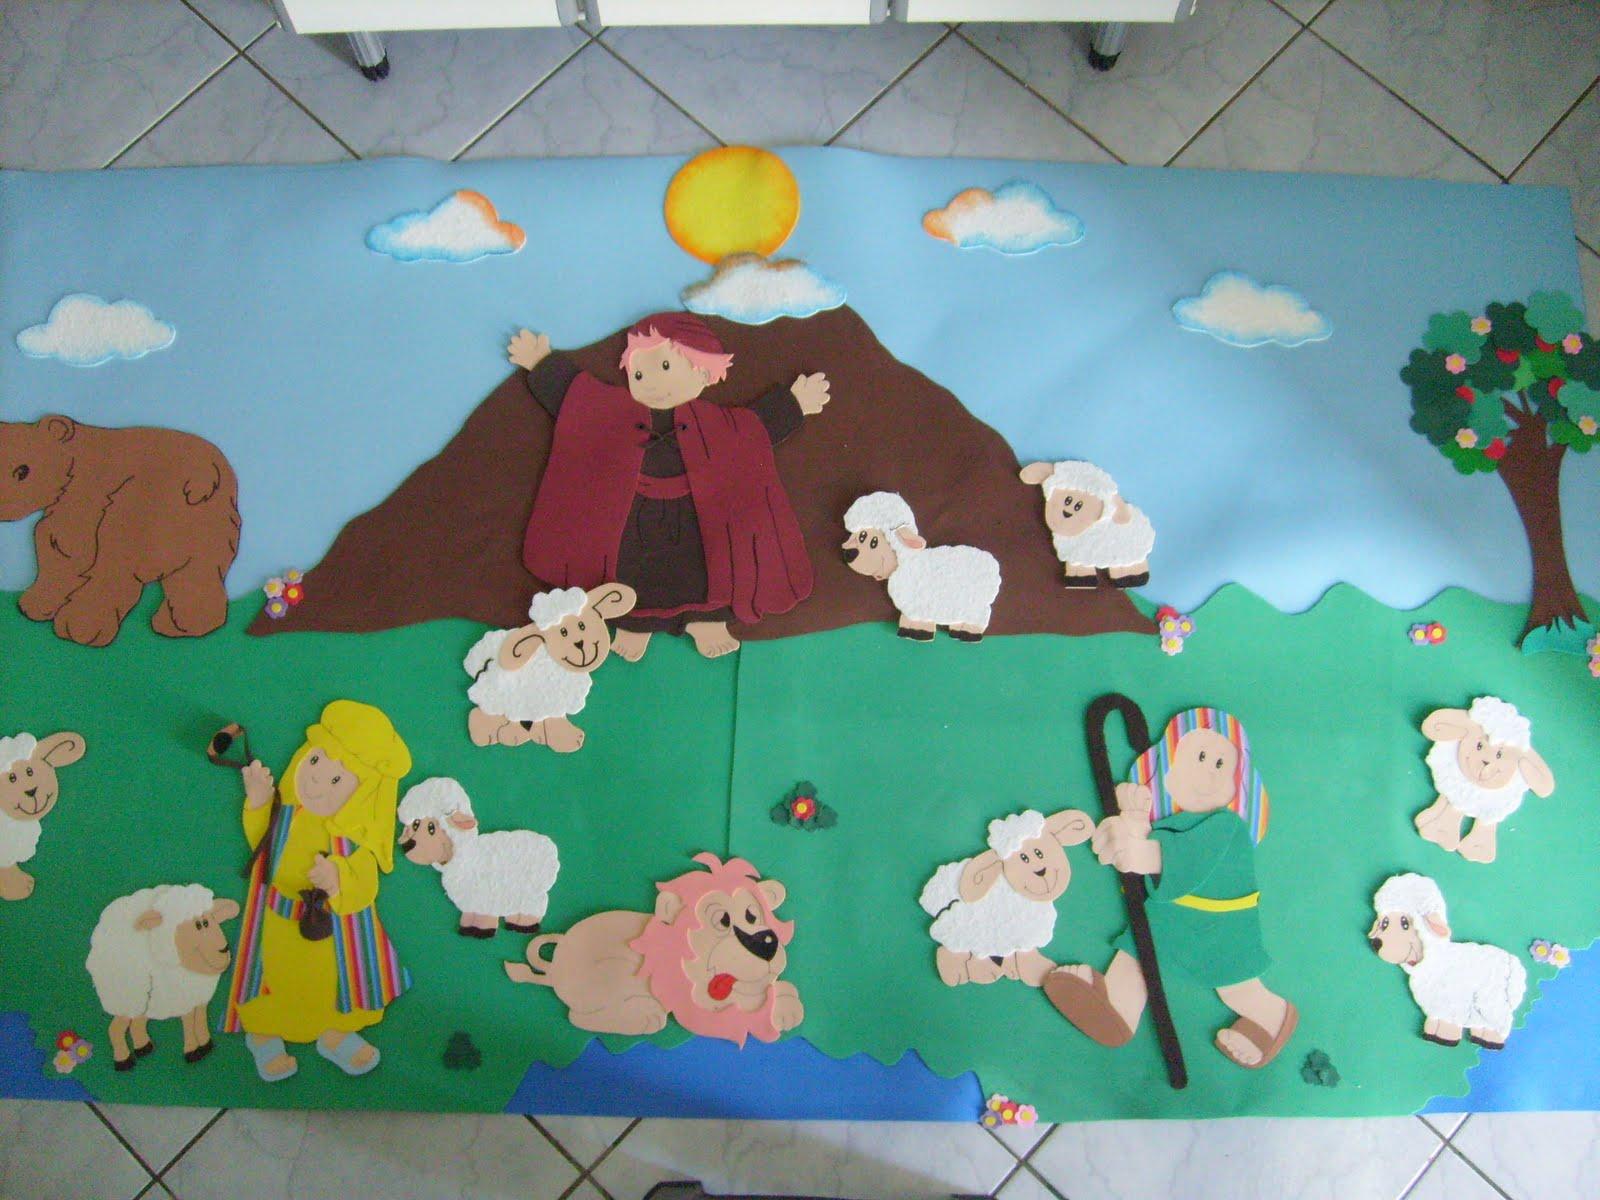 decoracao de sala infantil escola dominical : decoracao de sala infantil escola dominical:Fonte: http://pequenarteag.blogspot. com.br/2011/04/painel-rei- davi